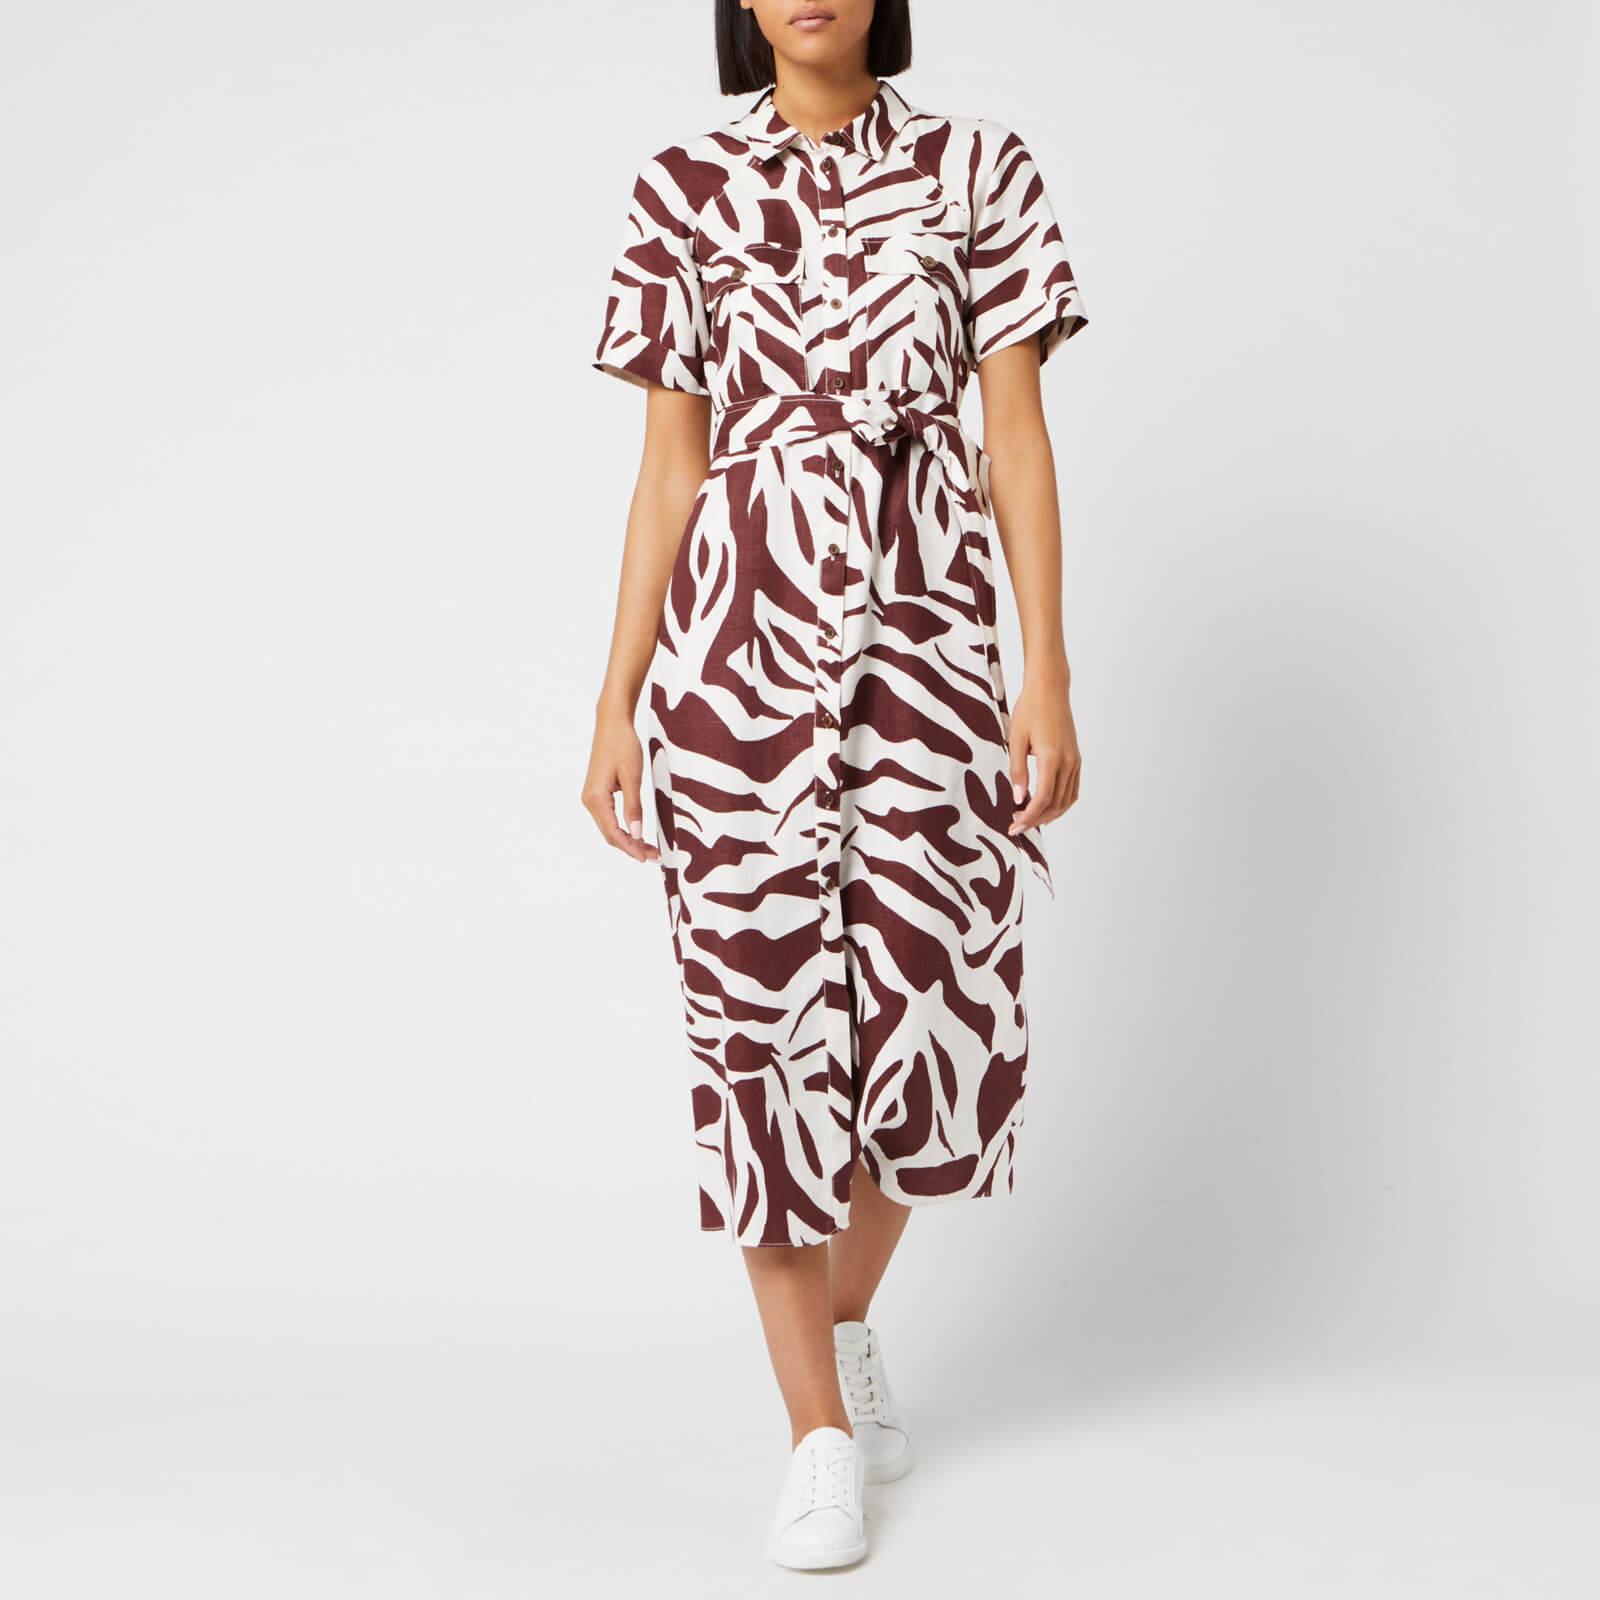 Whistles Women's Graphic Zebra Shirt Dress - Brown/Multi - UK 8 - Multi